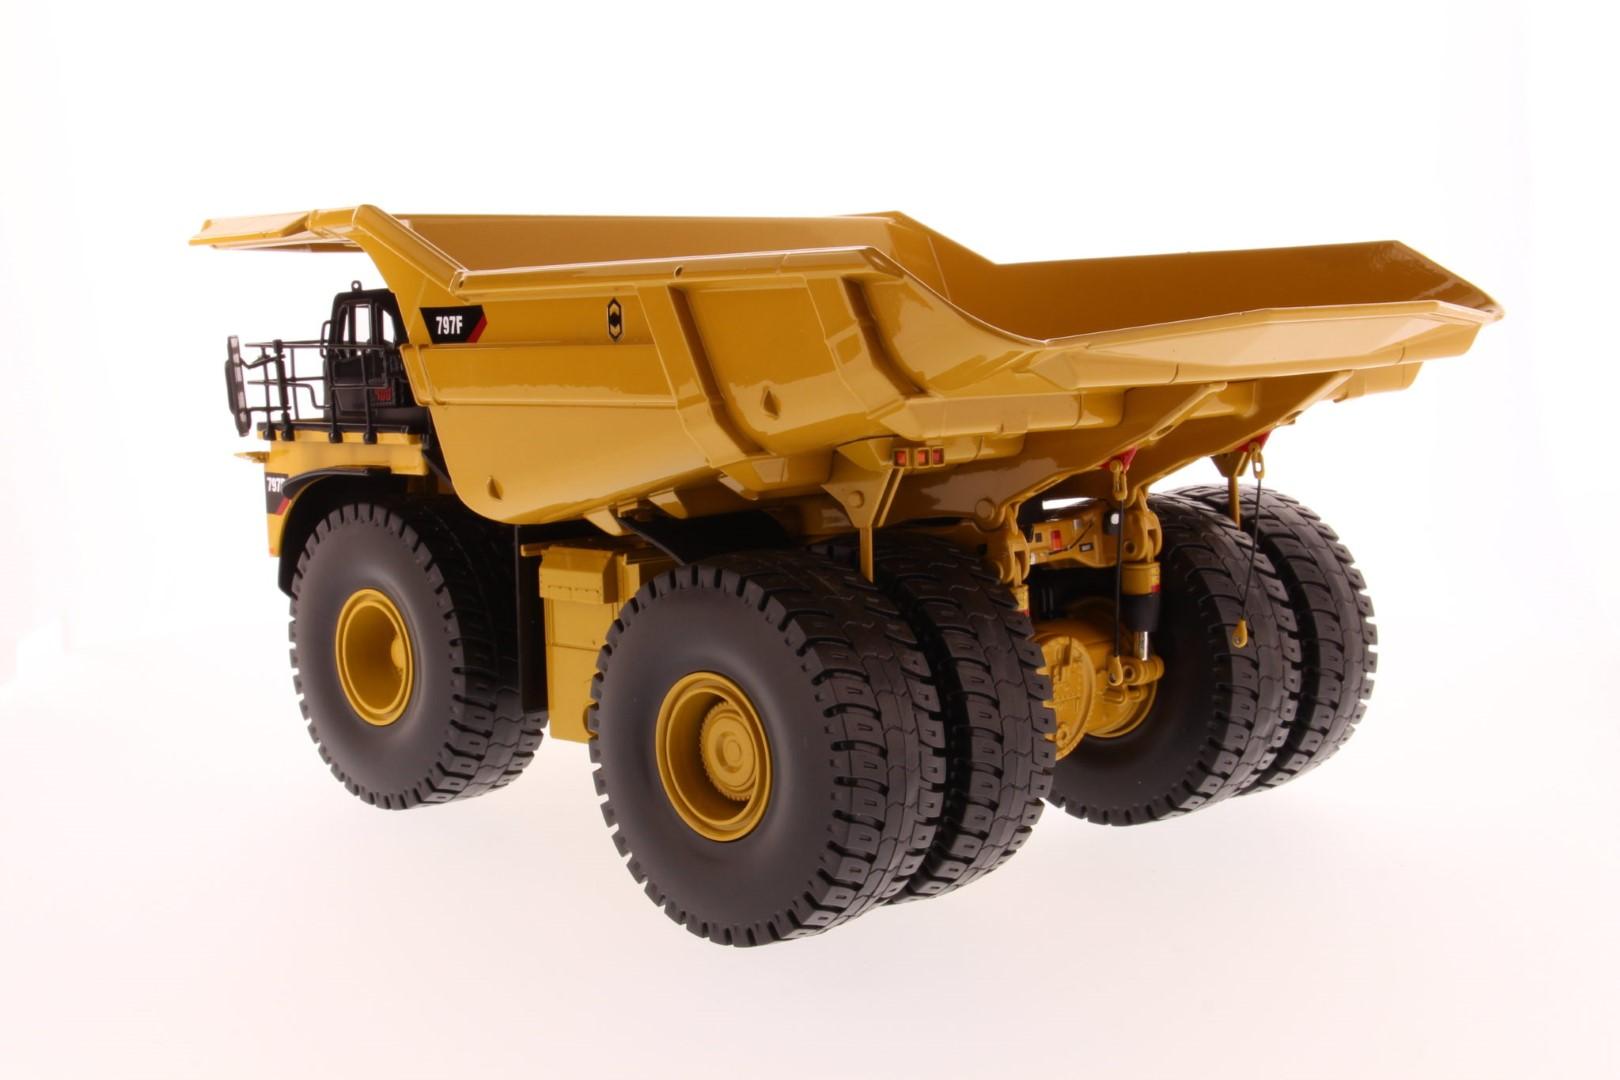 Diecast Masters CAT 797F Tier 4 Mining Truck - Image 3 of 5